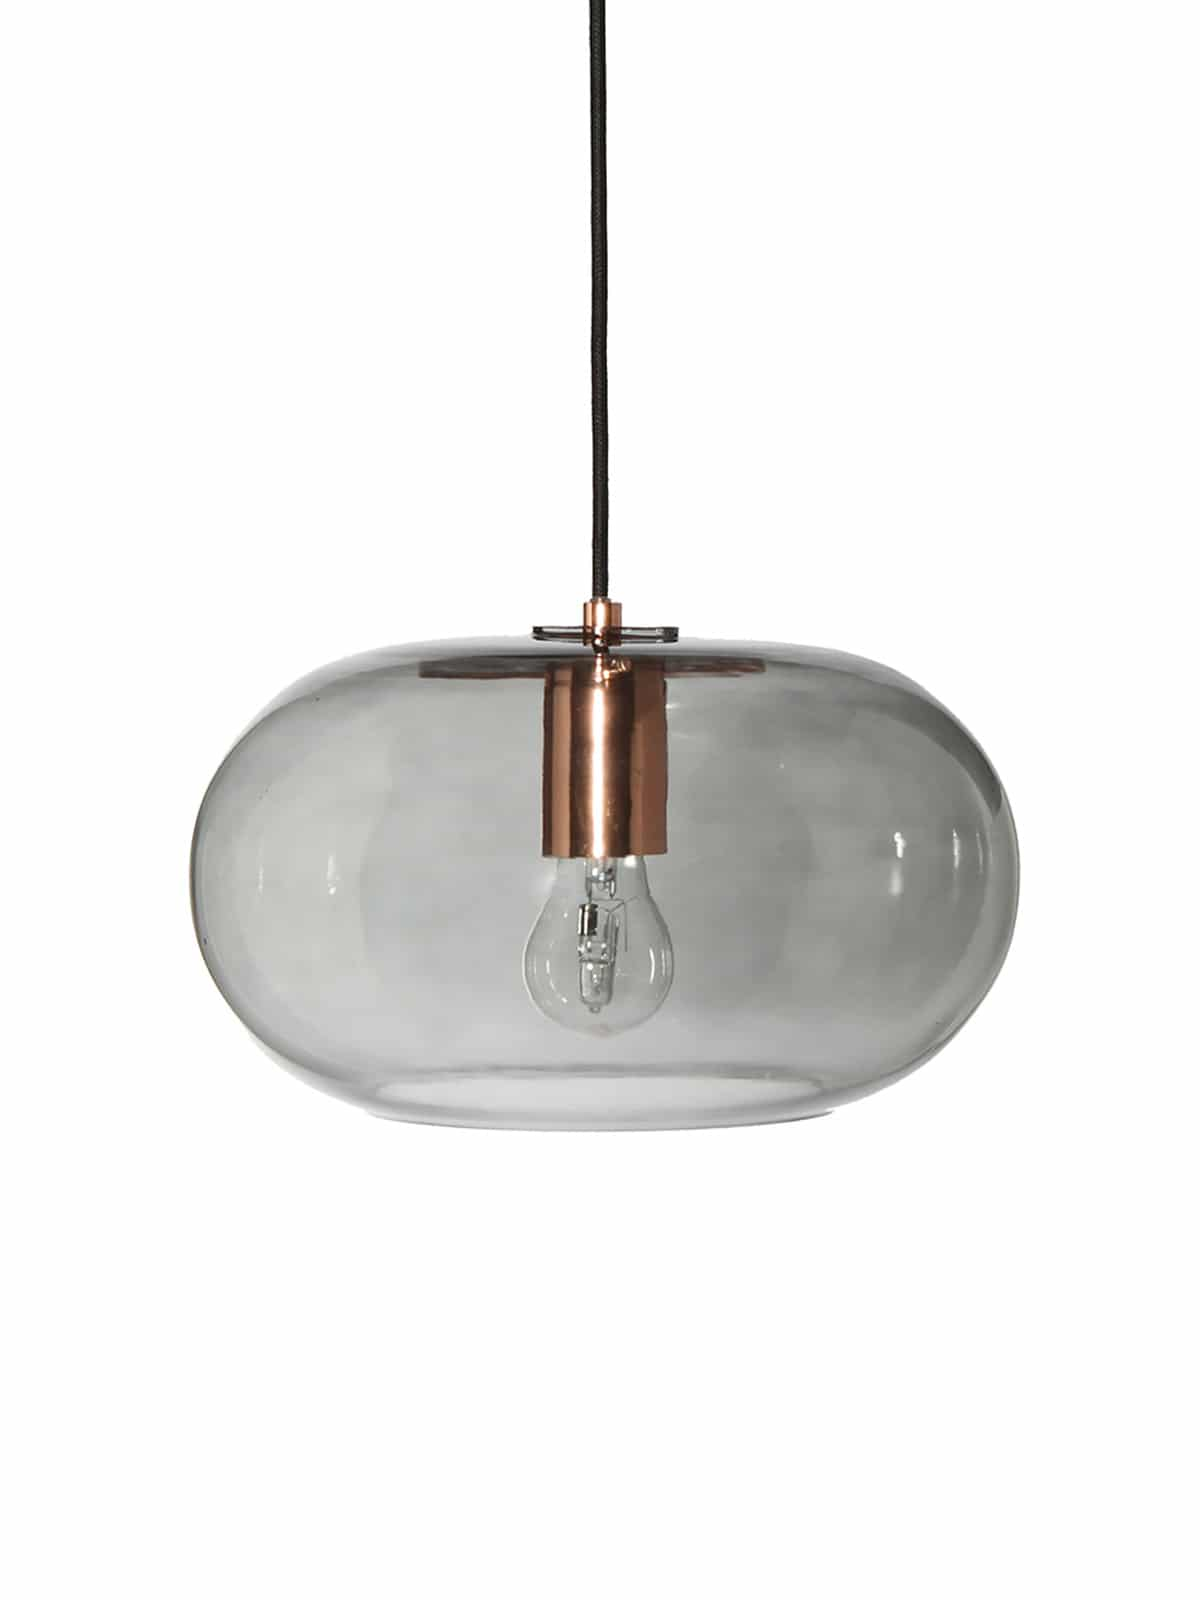 kobe new lampen leuchten designerleuchten online berlin design. Black Bedroom Furniture Sets. Home Design Ideas